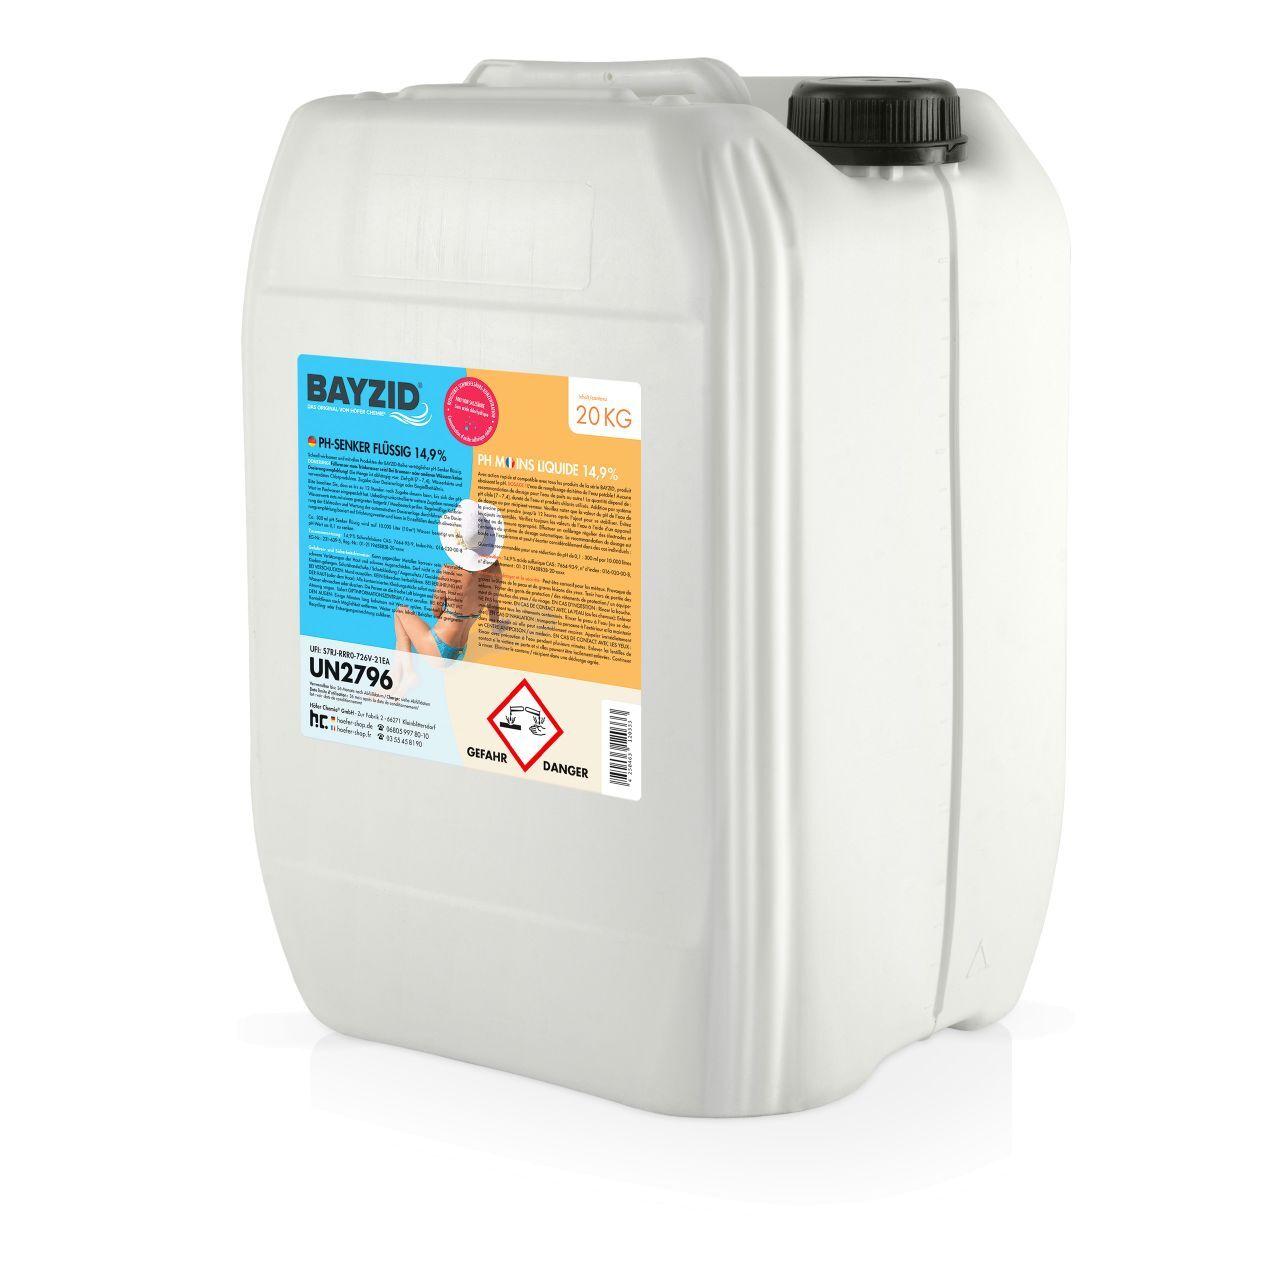 BAYZID 20 kg pH moins liquide (1 x 20 kg)